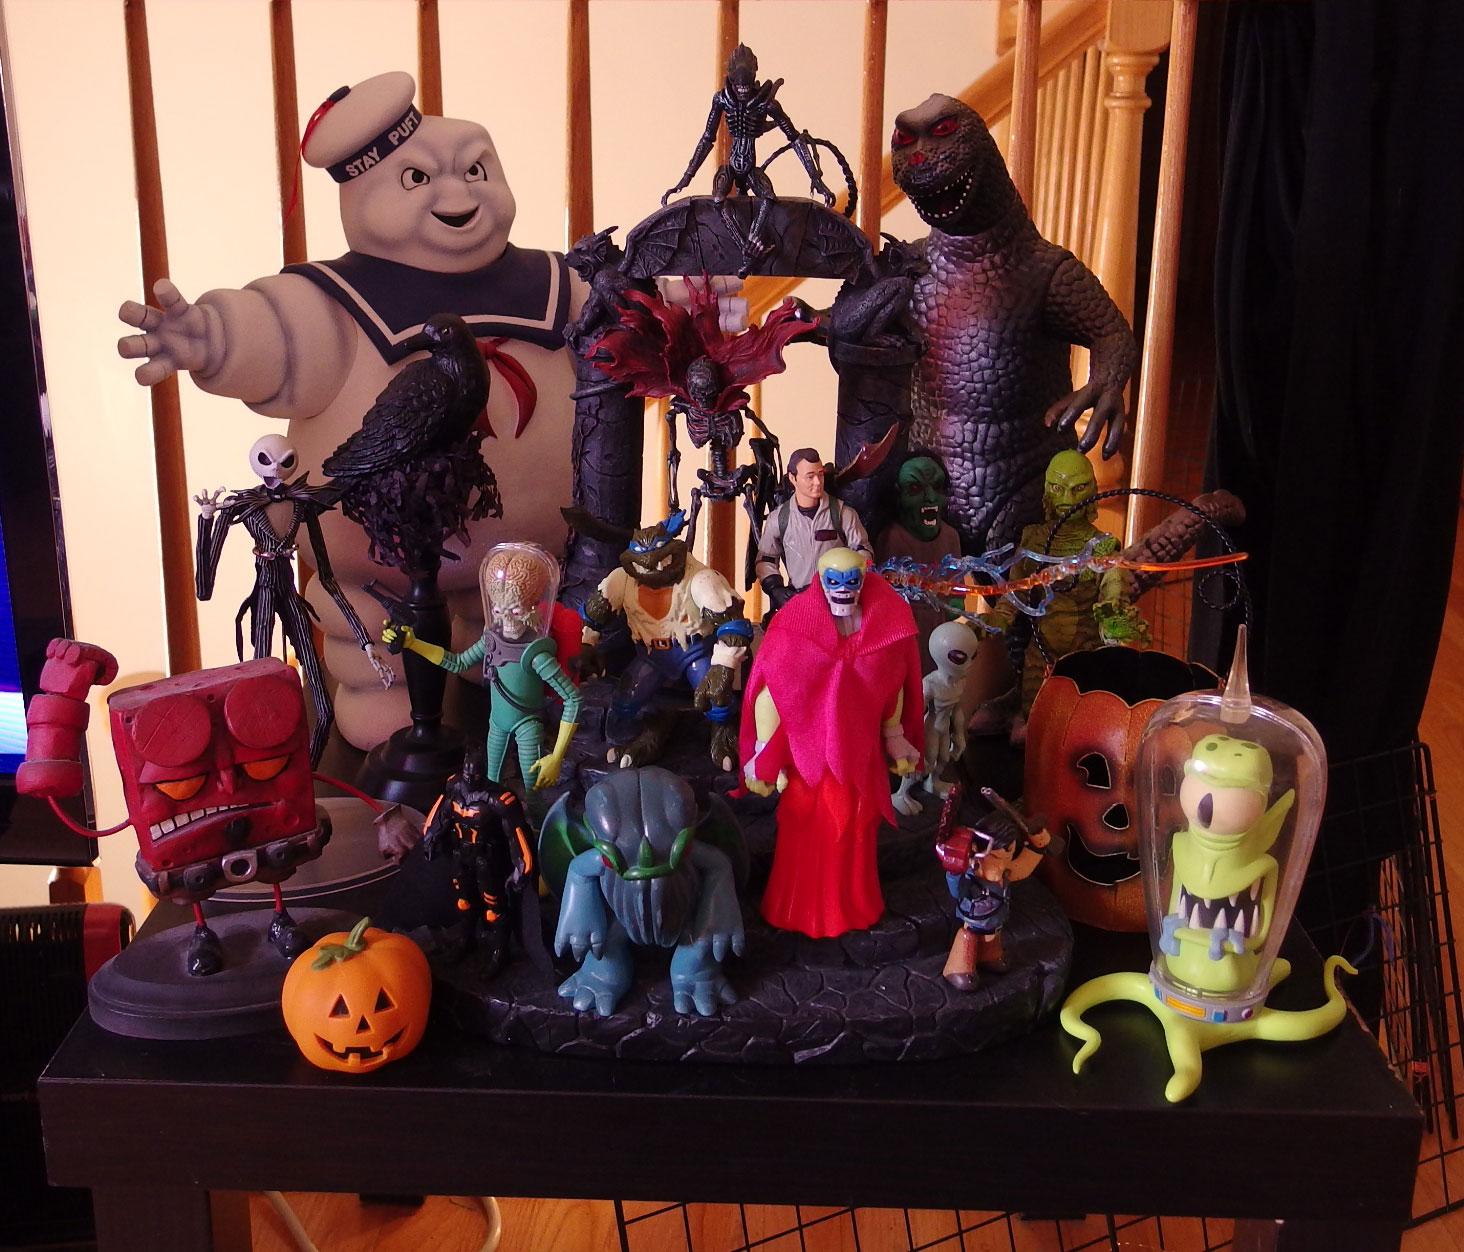 Poe's 2013 Halloween Mood Table!